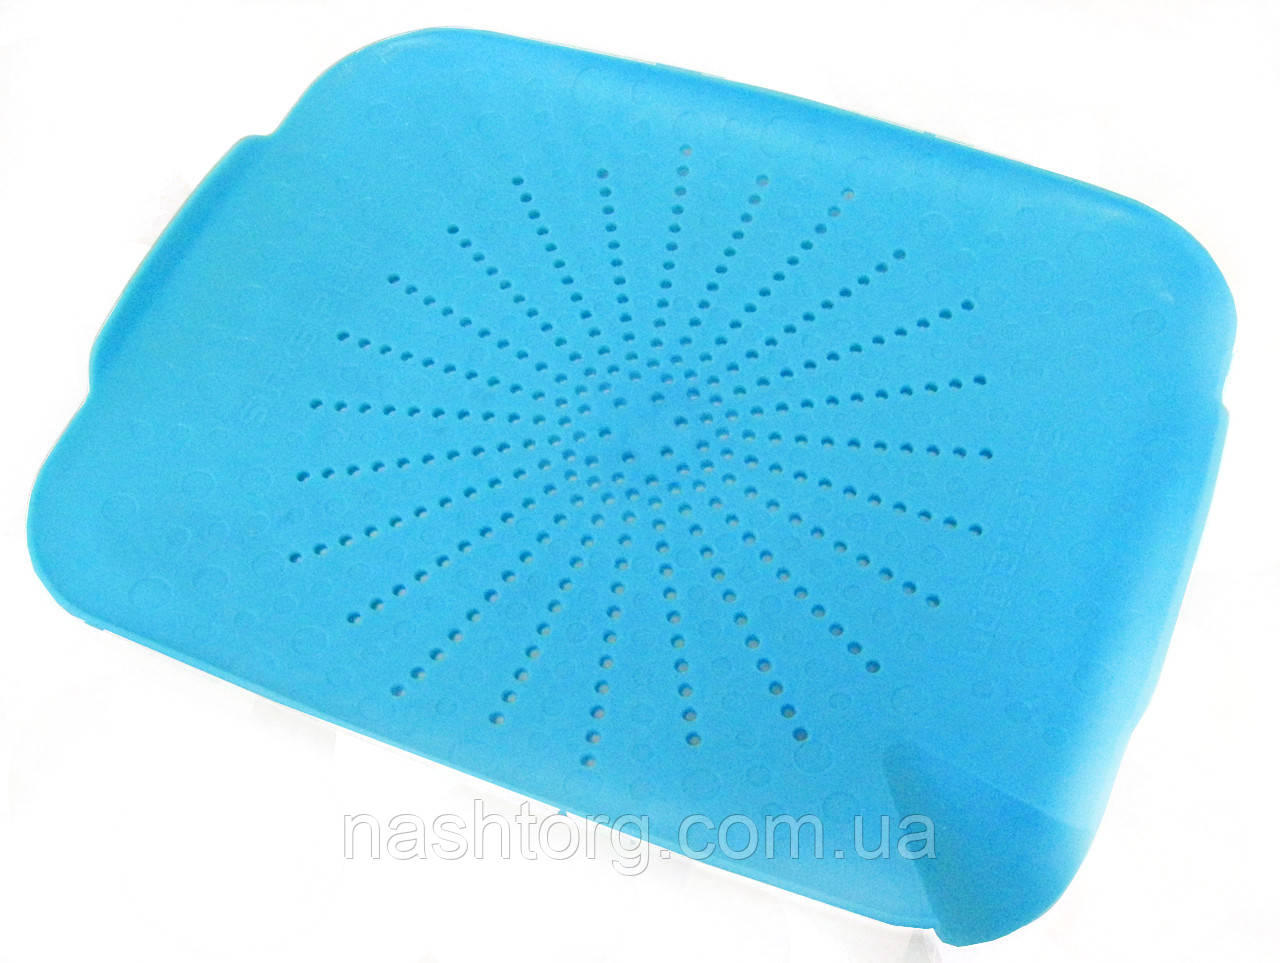 🔝 Дуршлаг на раковину, коврик-дуршлаг, пластиковый, цвет - голубой   🎁%🚚